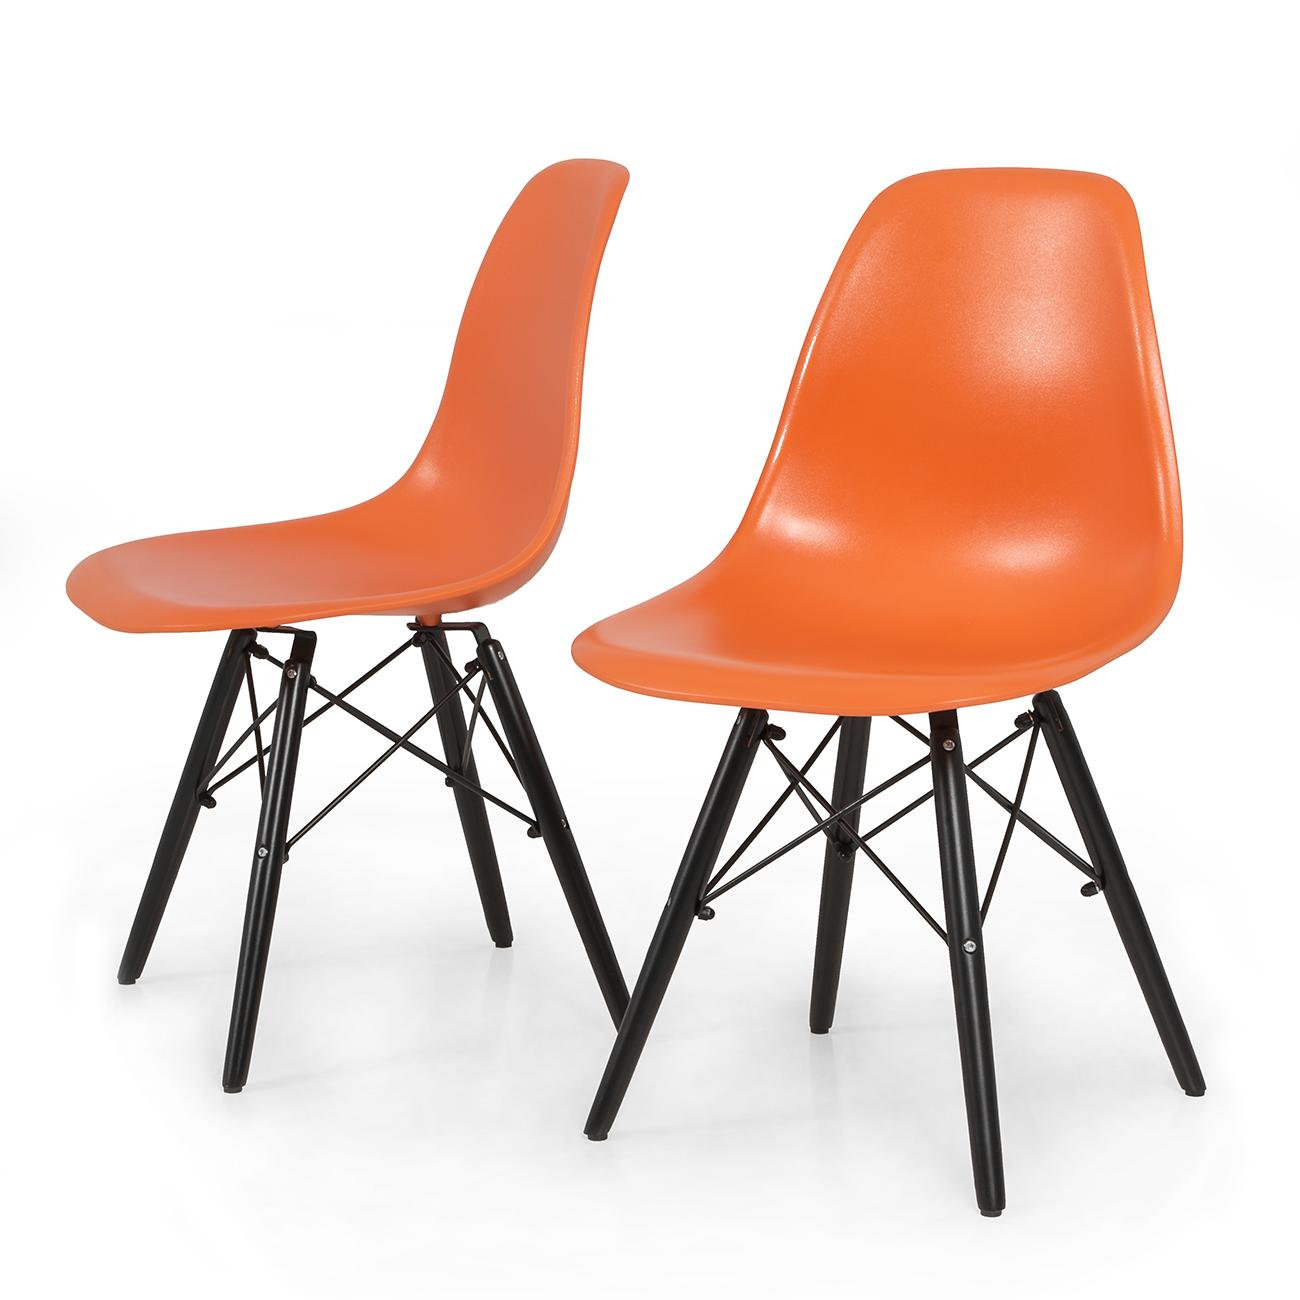 eames style plastic chair oak fabric dining chairs 2x dsw molded abs side eiffel dowel wood leg